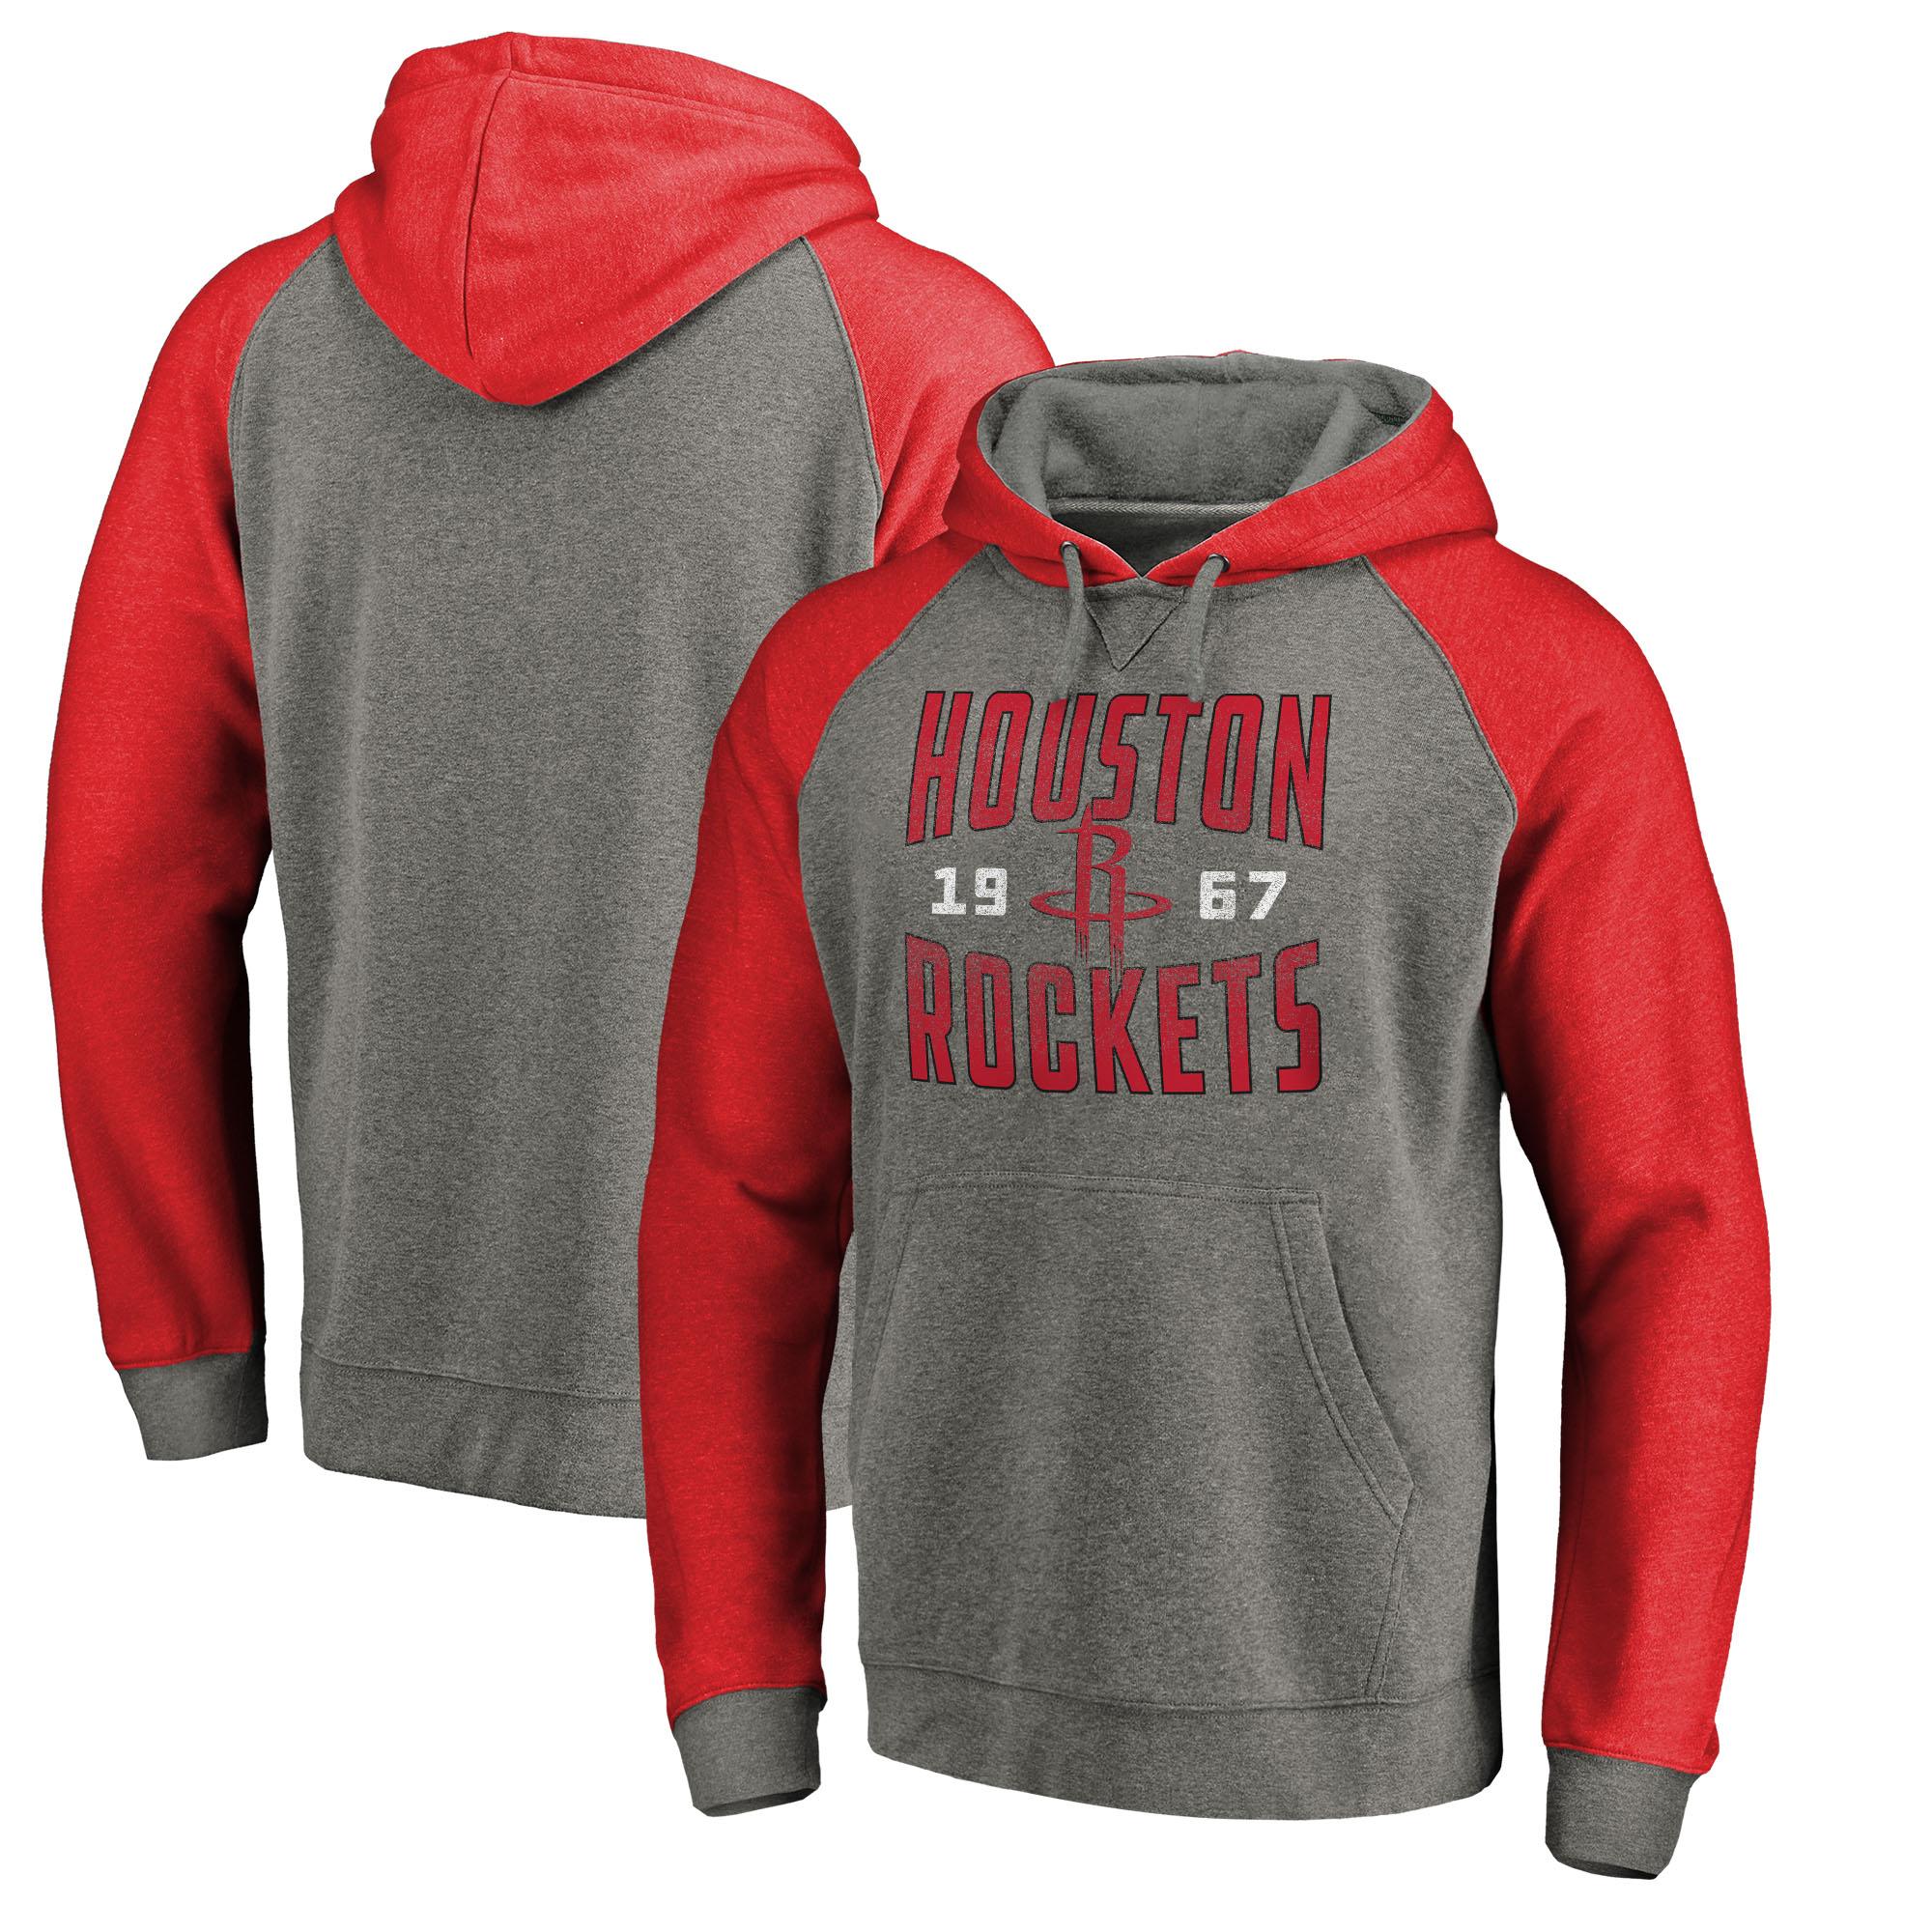 Houston Rockets Fanatics Branded Ash Antique Stack Tri-Blend Raglan Pullover Hoodie